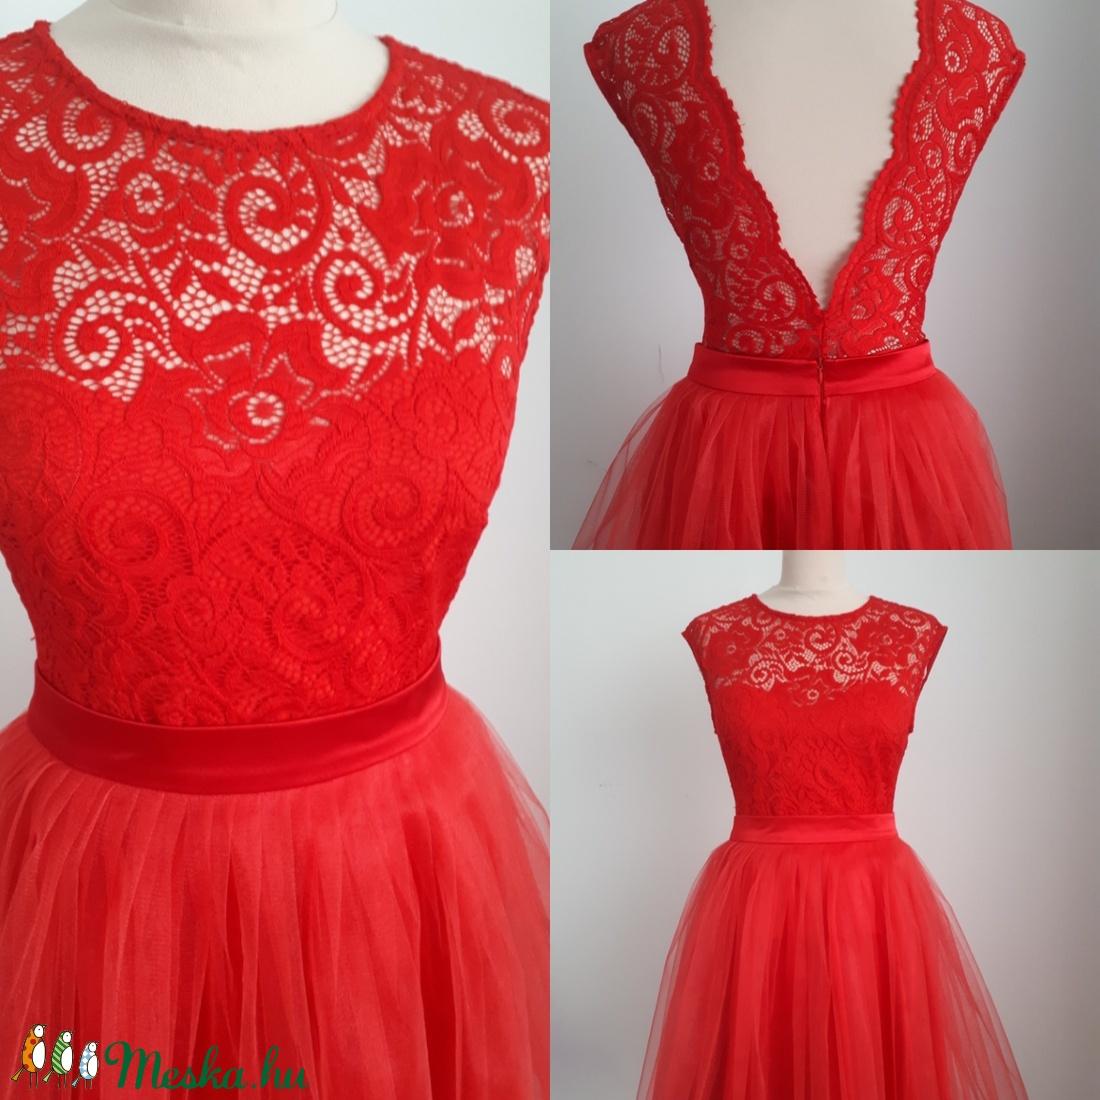 Nelli piros csipkebody (Naybel) - Meska.hu 9ff7a0d59c